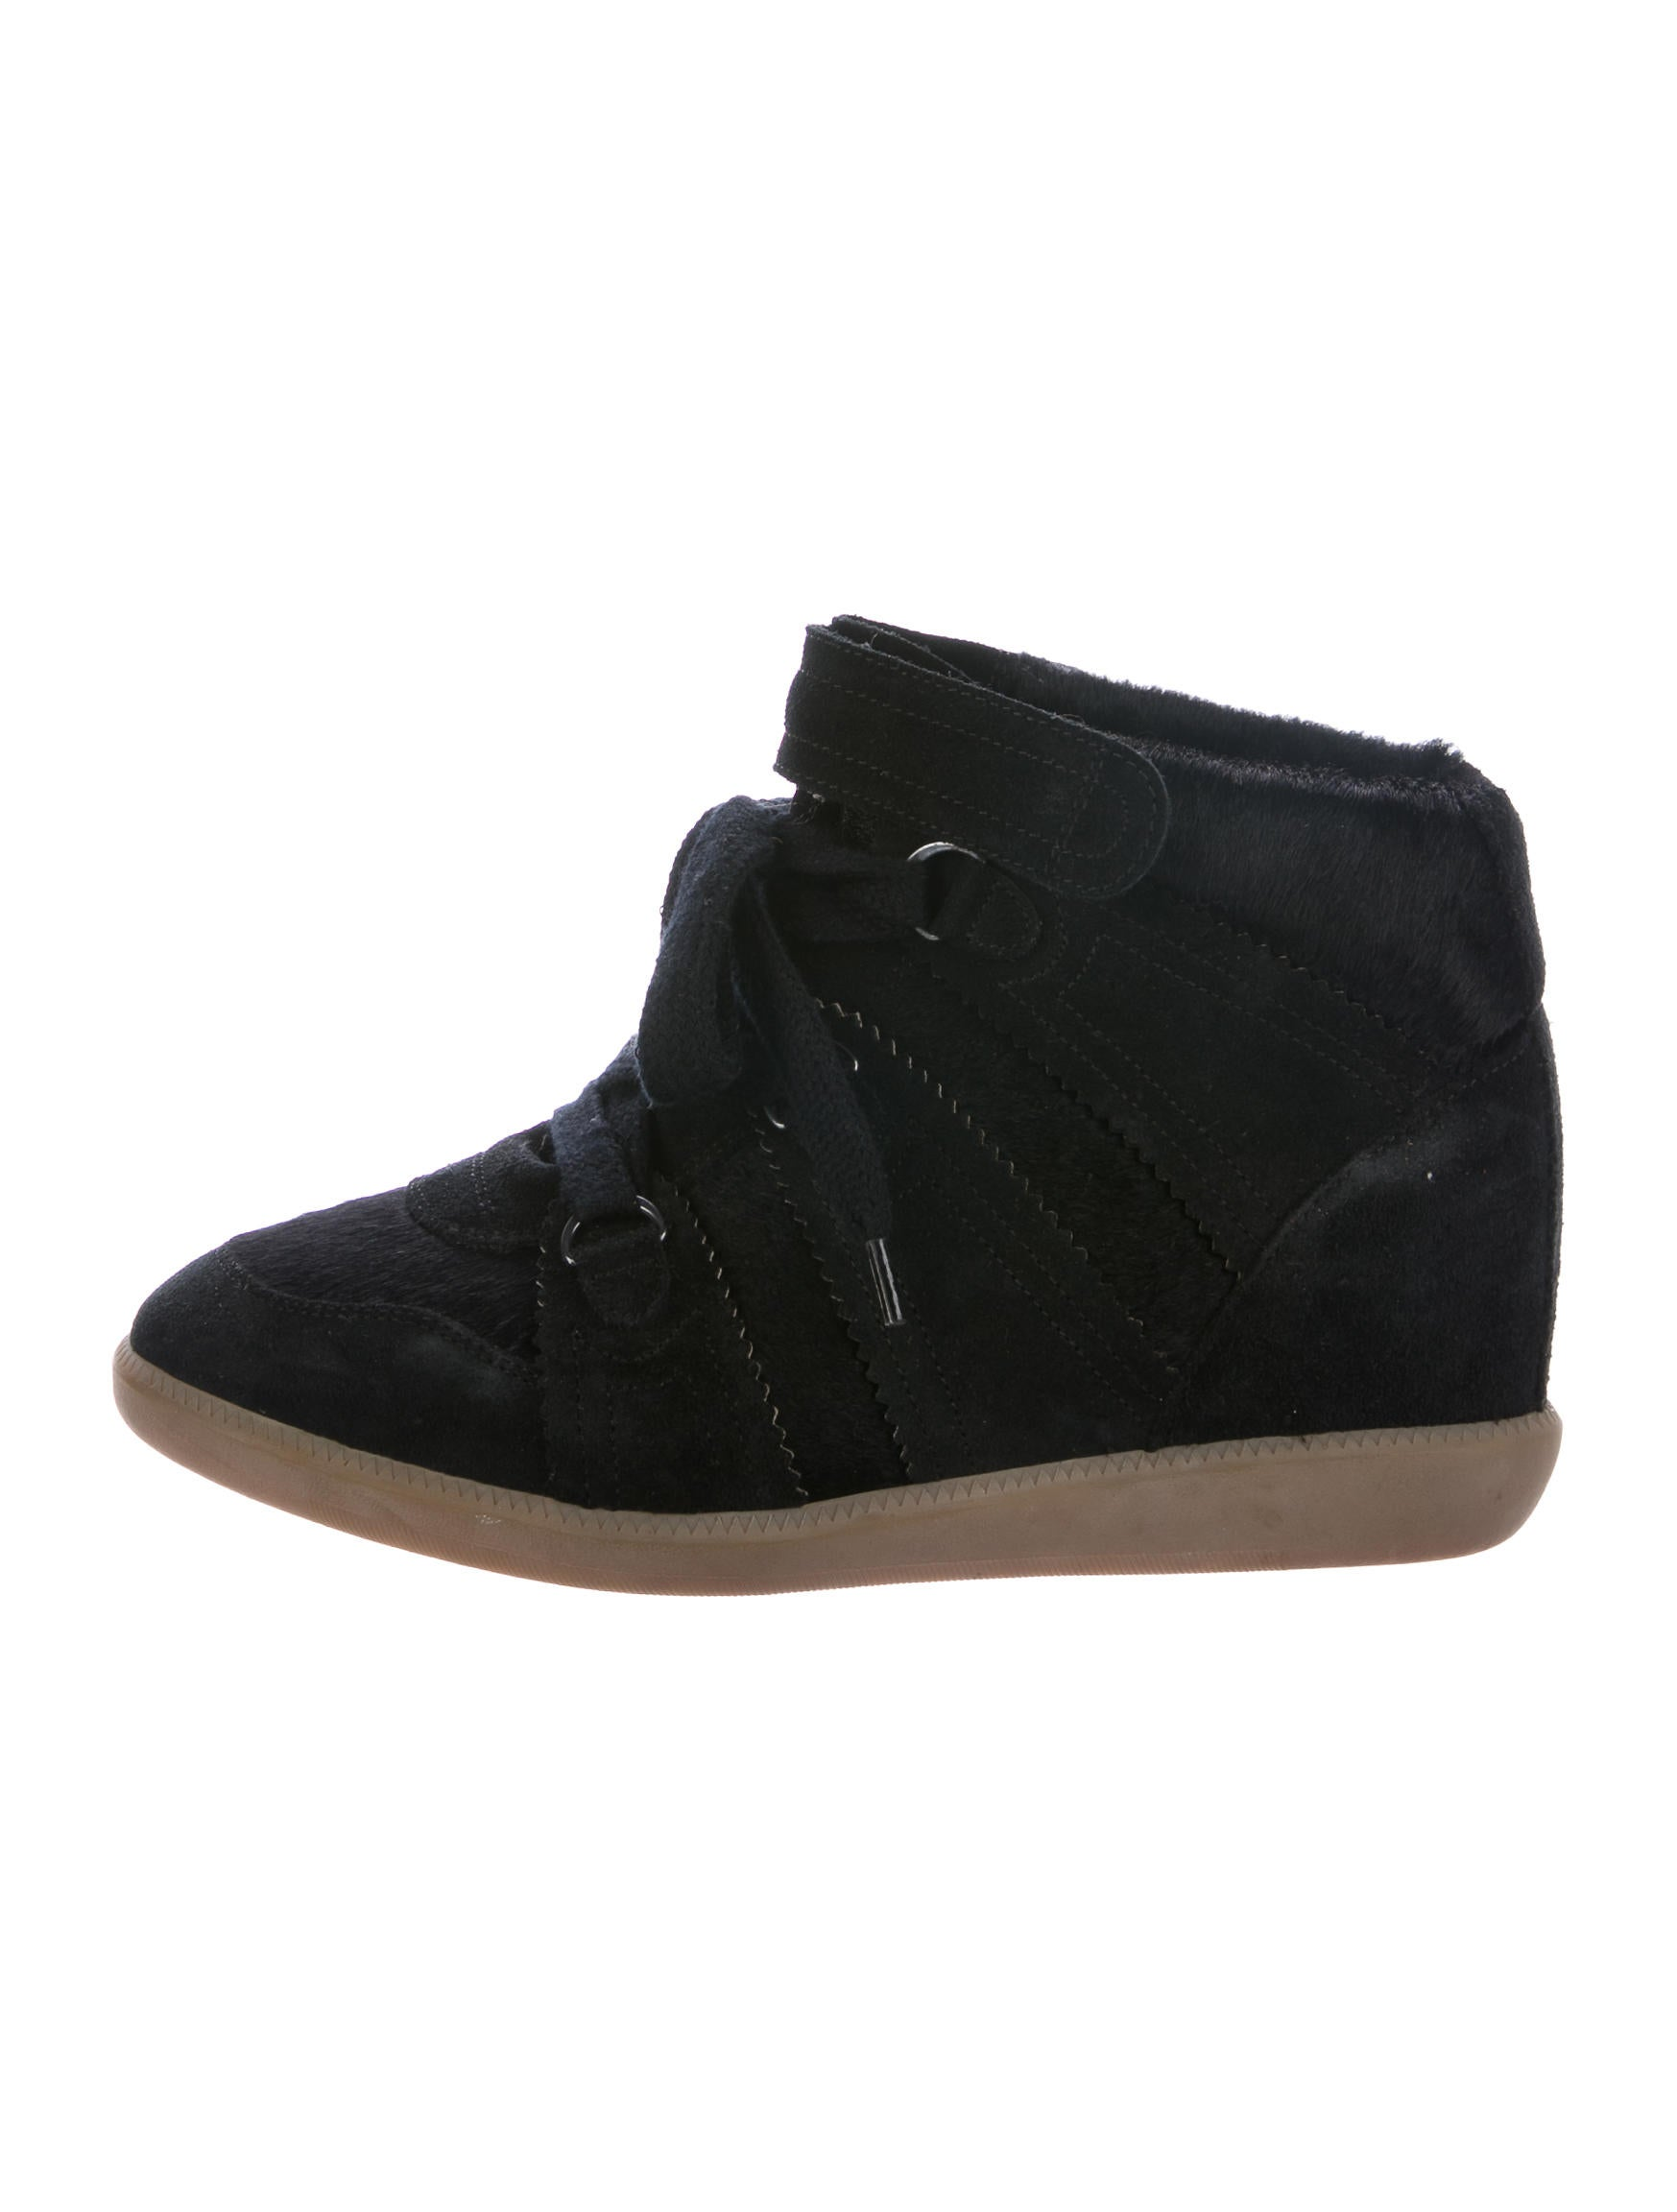 isabel marant basket wedge sneakers shoes isa45395 the realreal. Black Bedroom Furniture Sets. Home Design Ideas